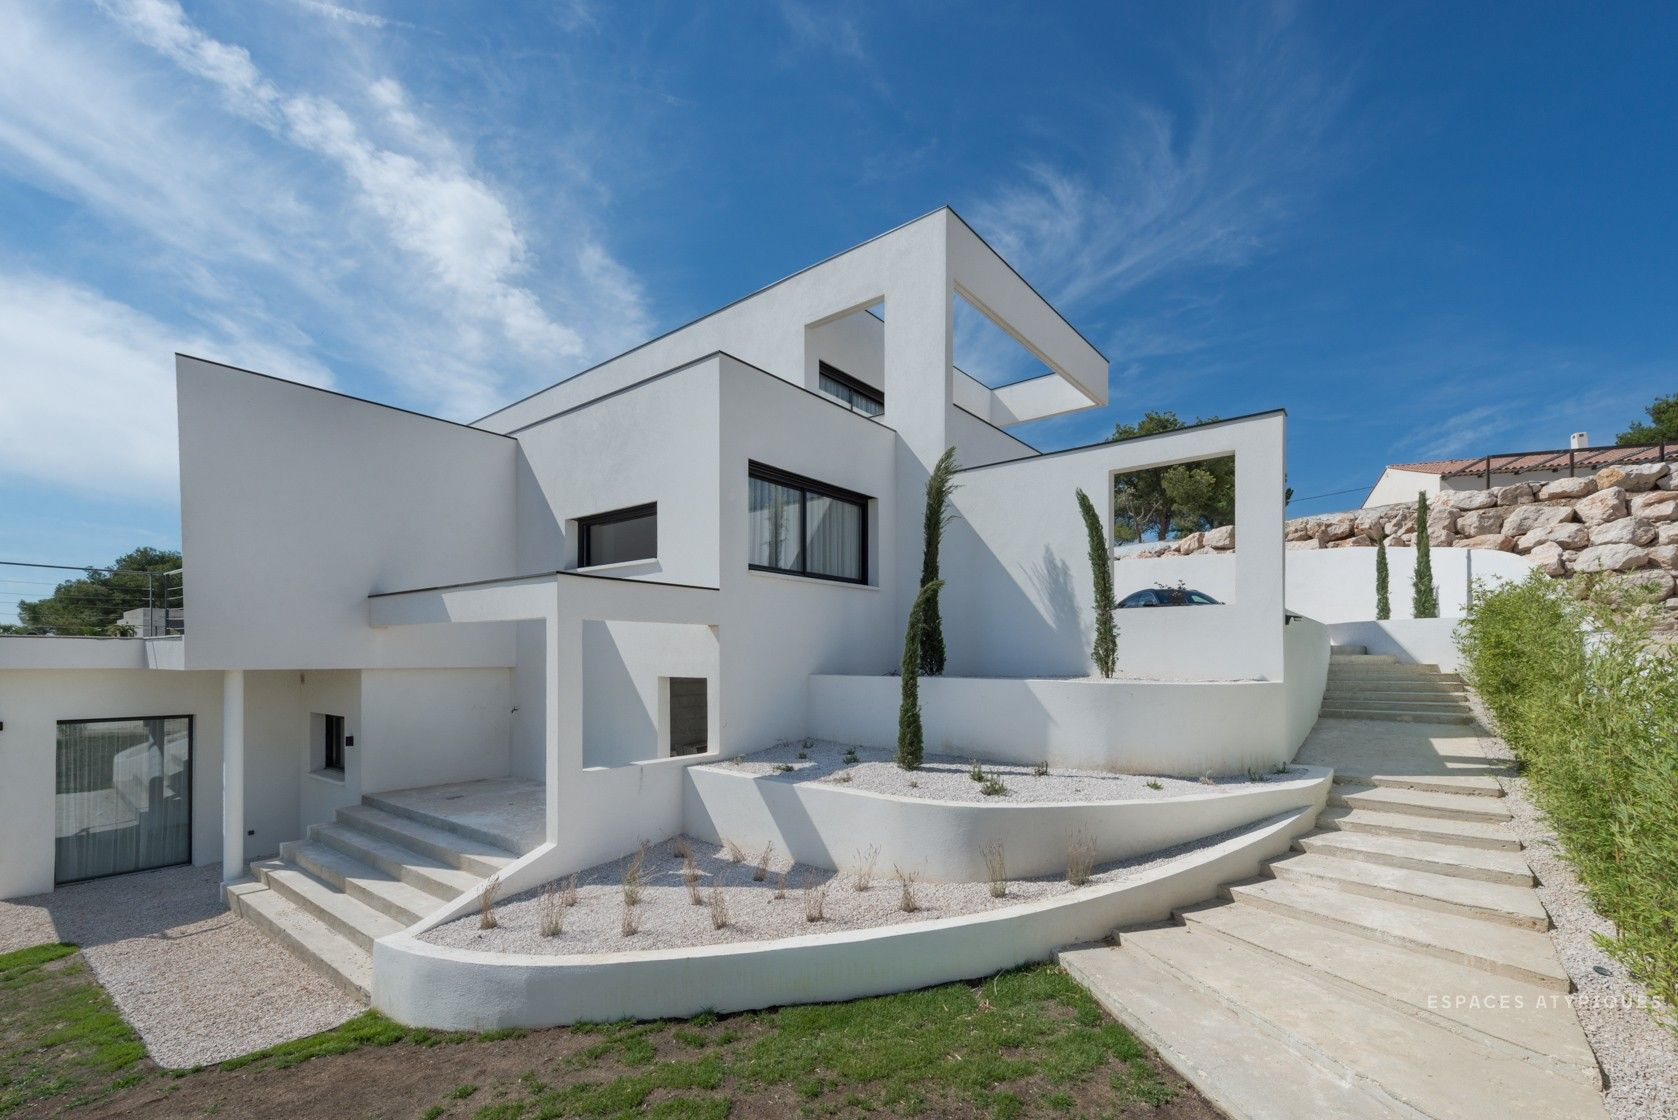 Espace Atypique Aix En Provence ventabren : villa minimaliste d'inspiration mallet stevens